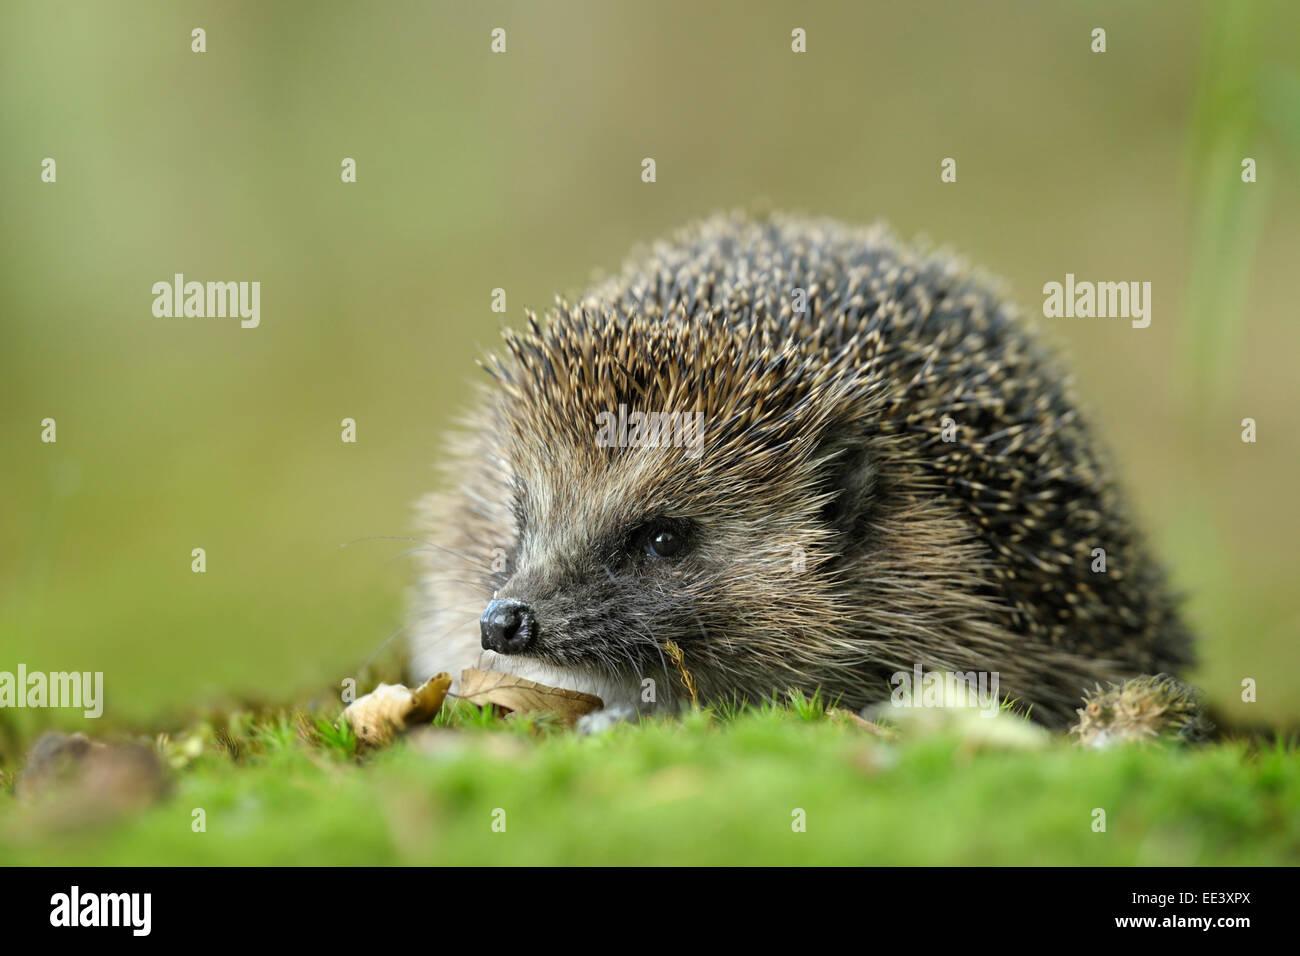 hedgehog [Erinaceus europaeus] Stock Photo